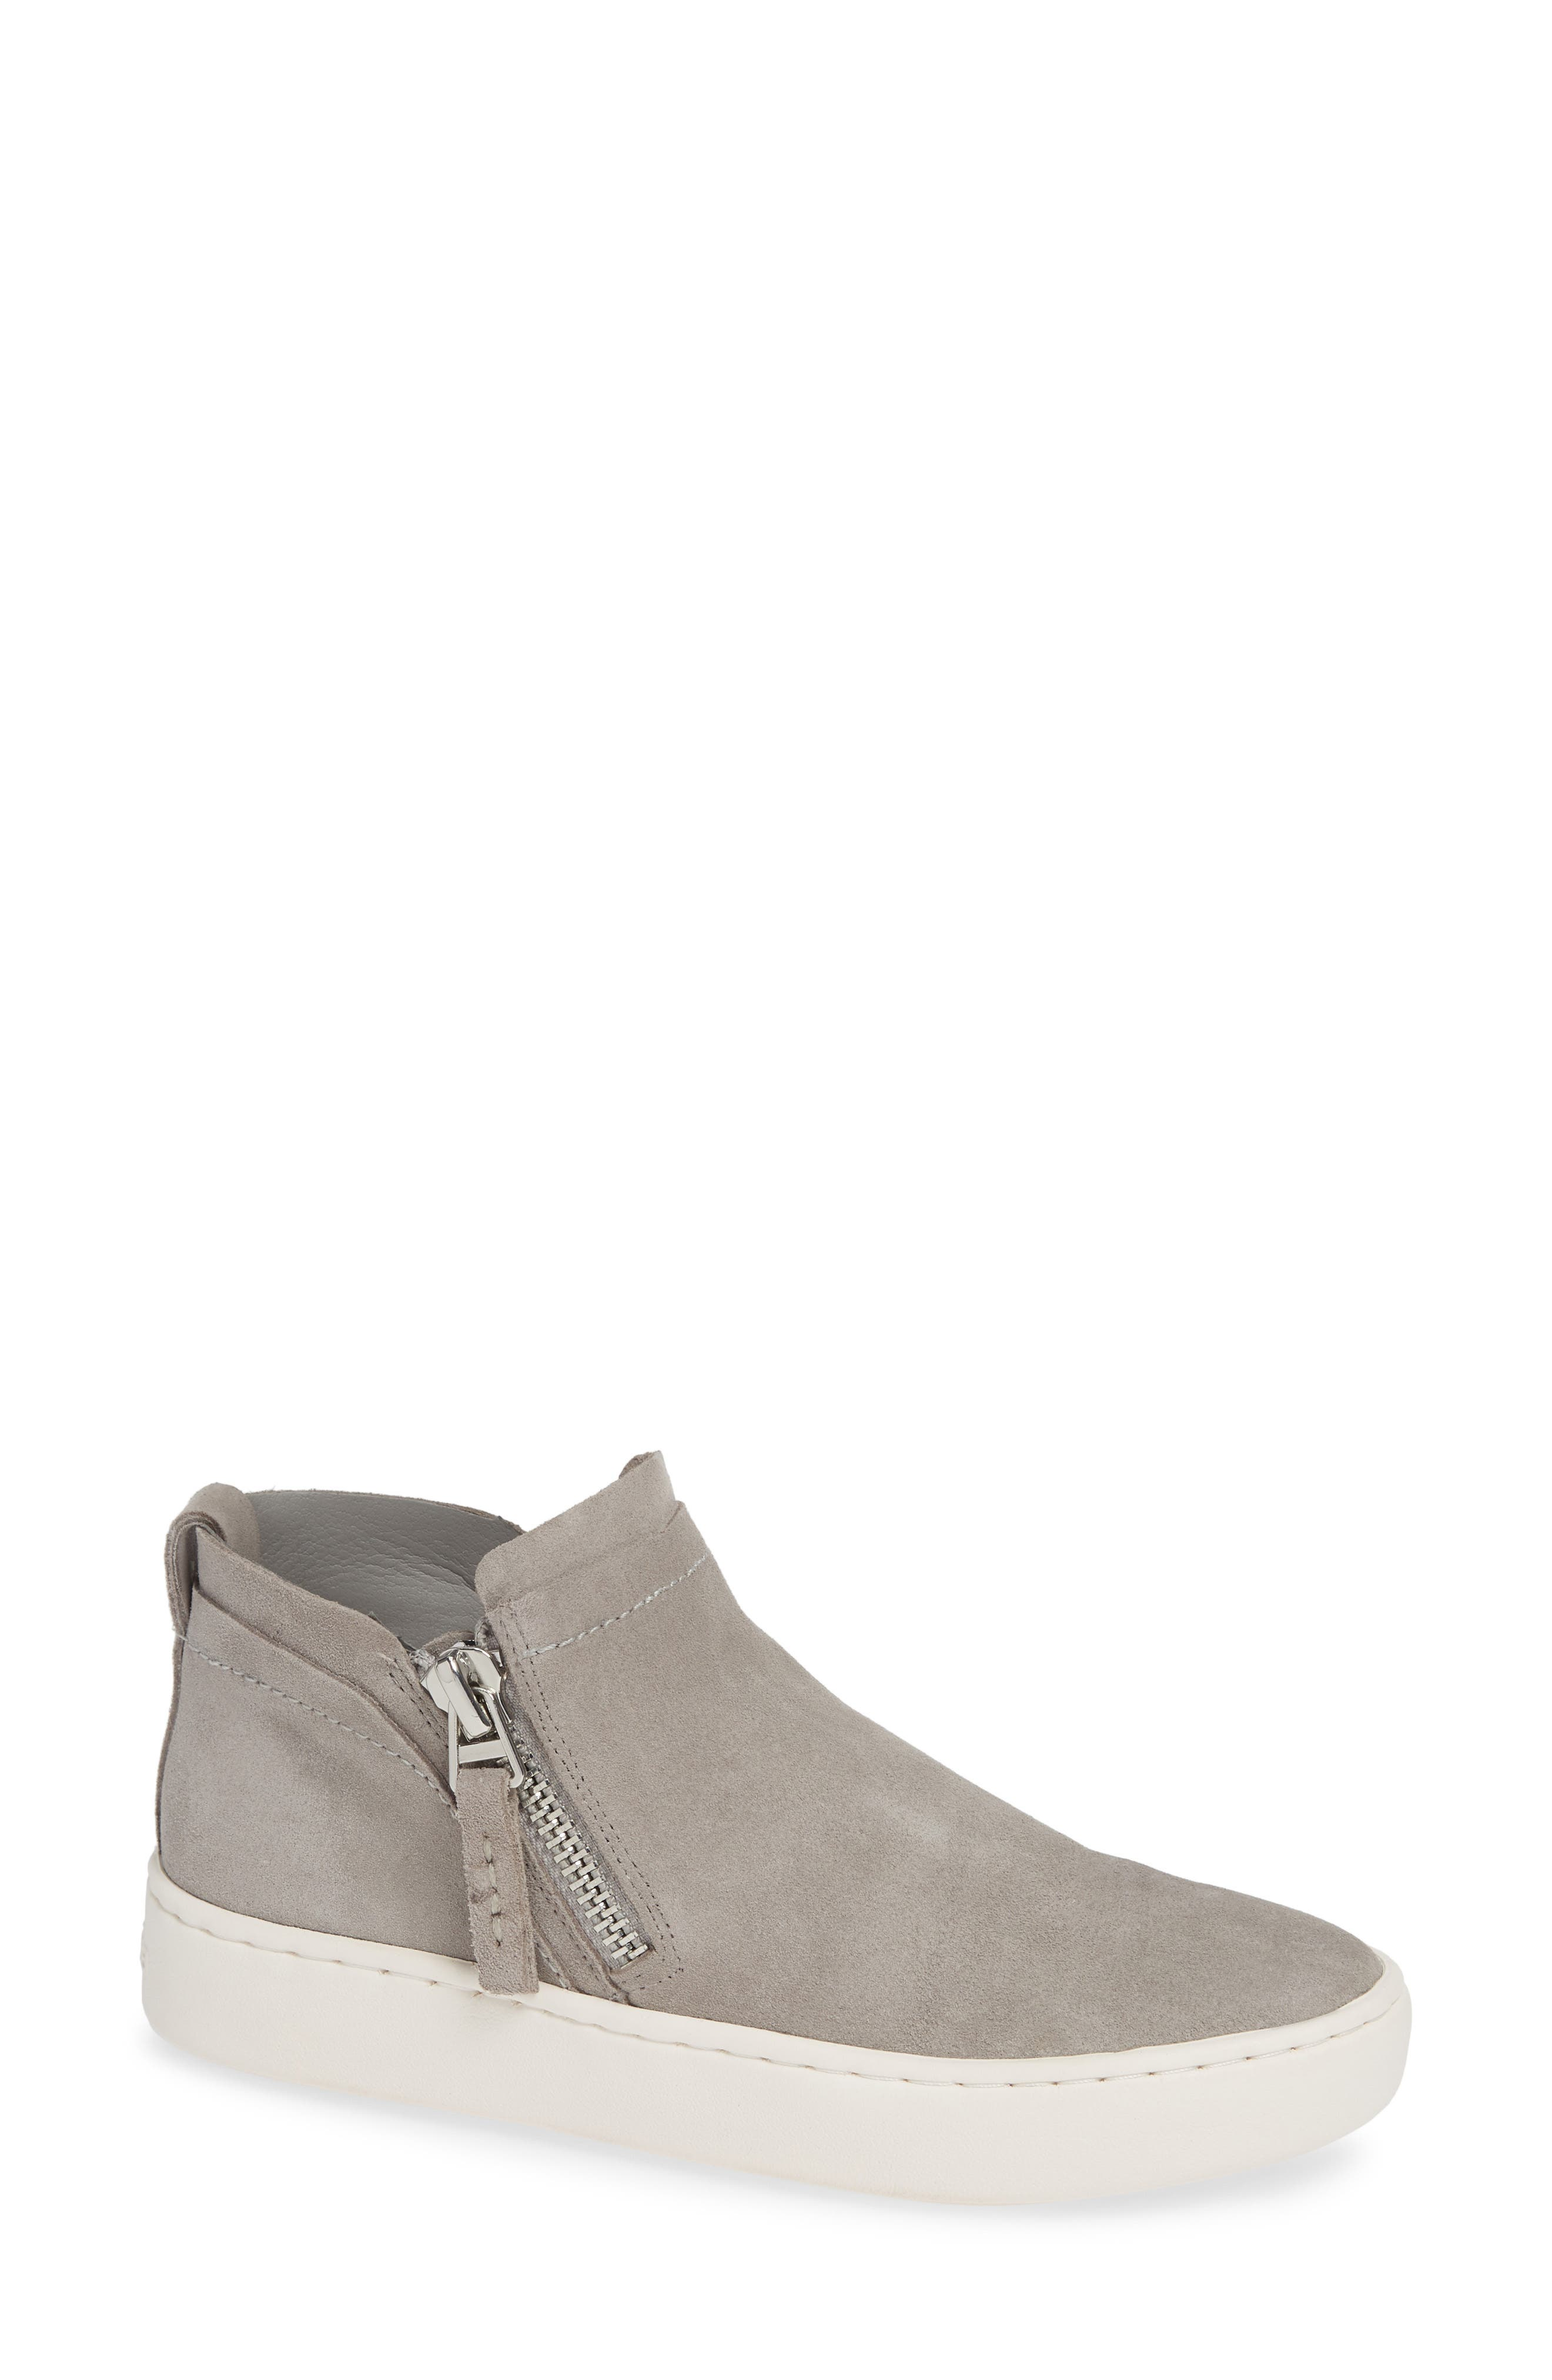 DOLCE VITA Tobee Zip Sneaker, Main, color, SMOKE SUEDE